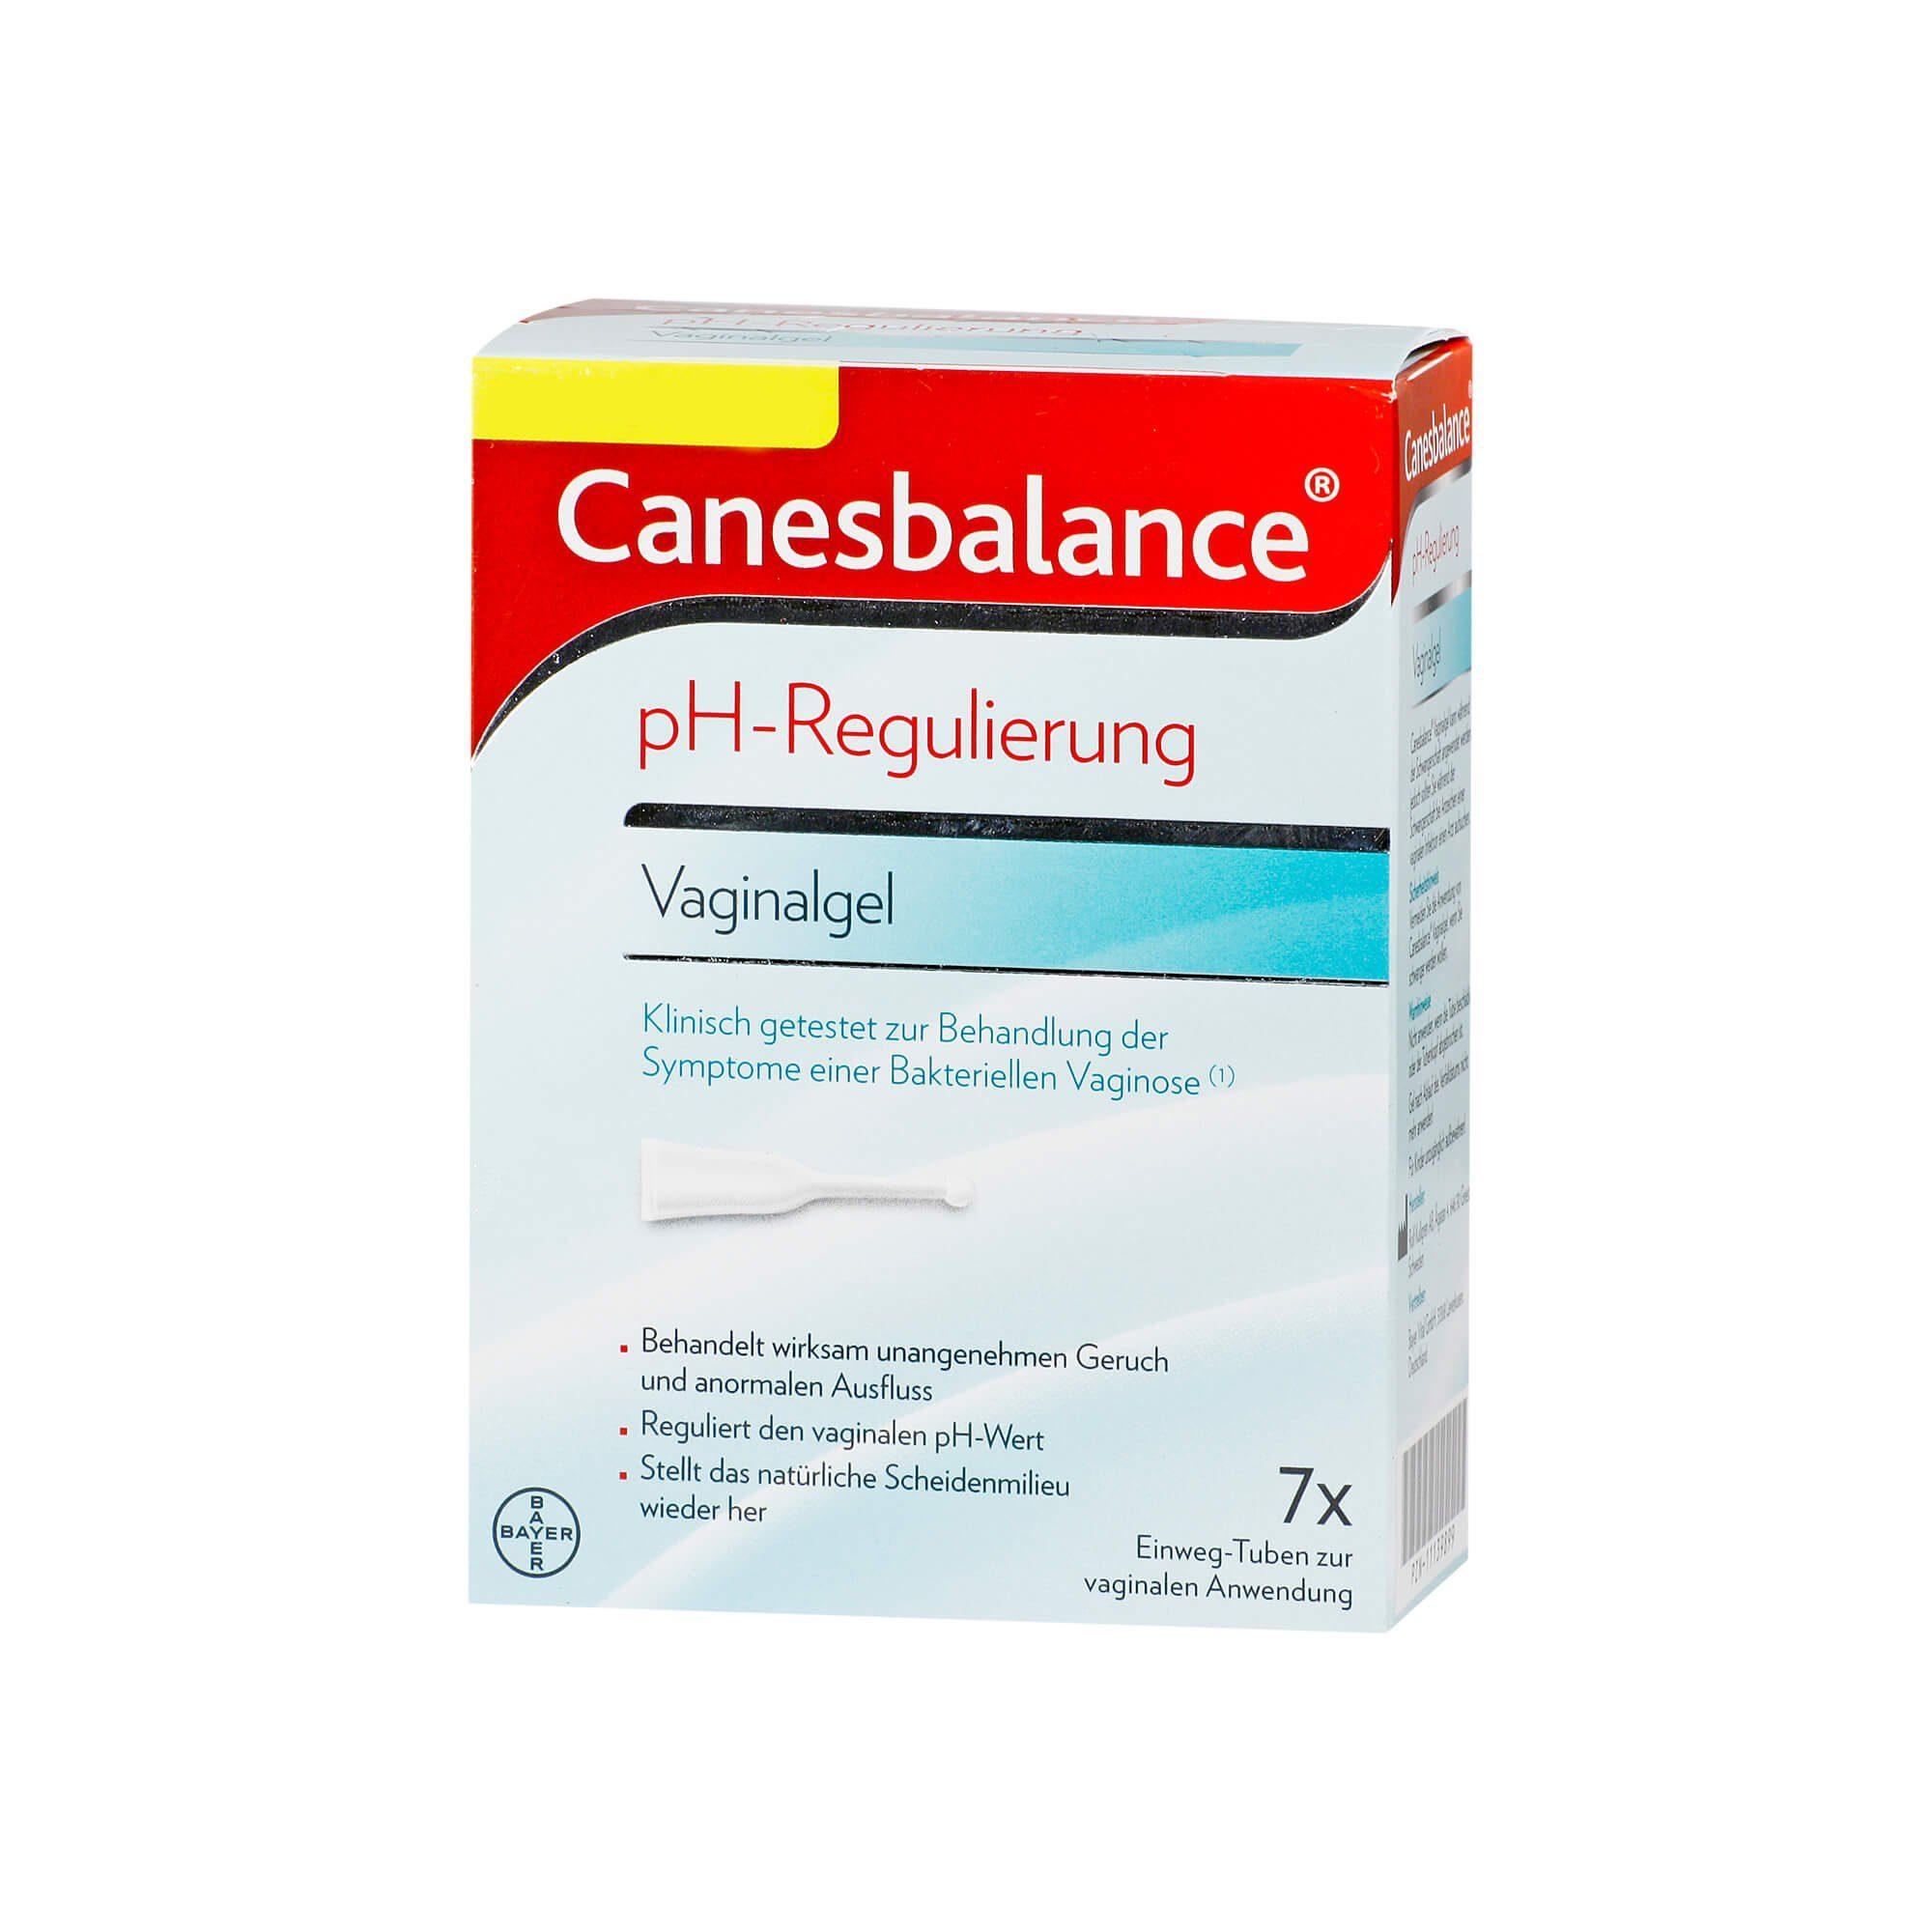 Canesbalance pH-Regulierung Vaginalgel , 7X5 ml